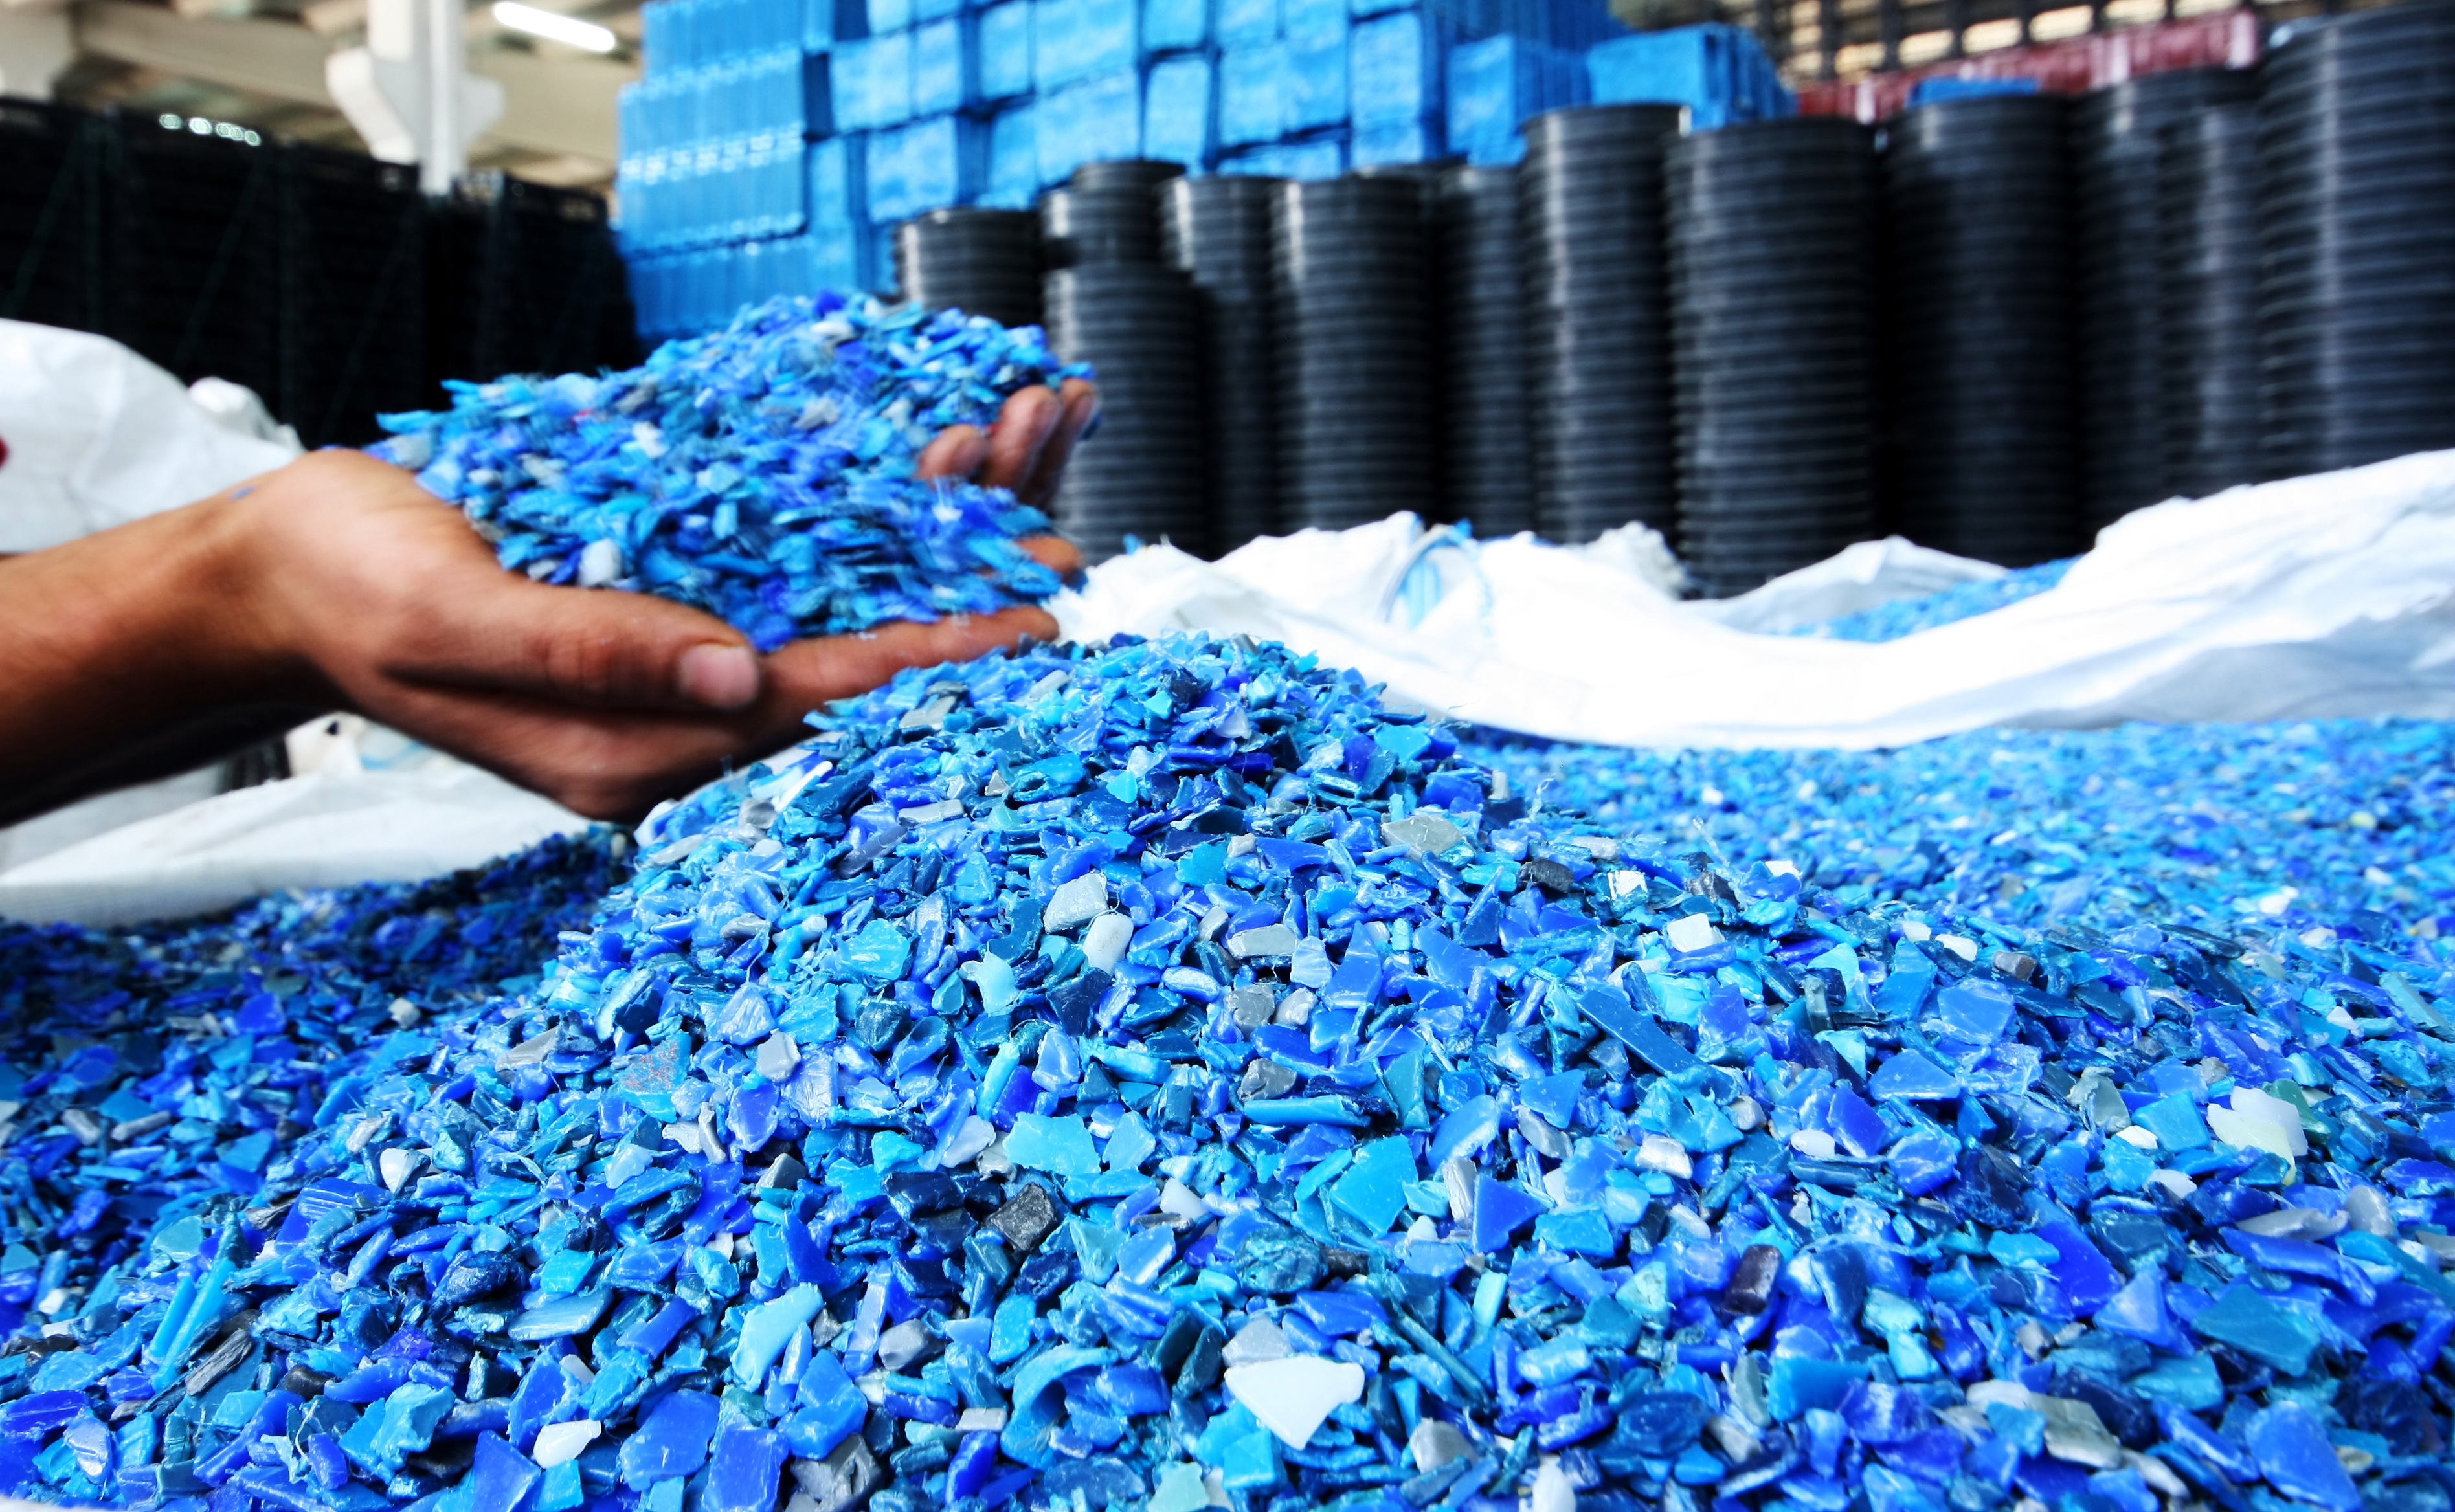 Plastics-Resin-Pellets-in-hands